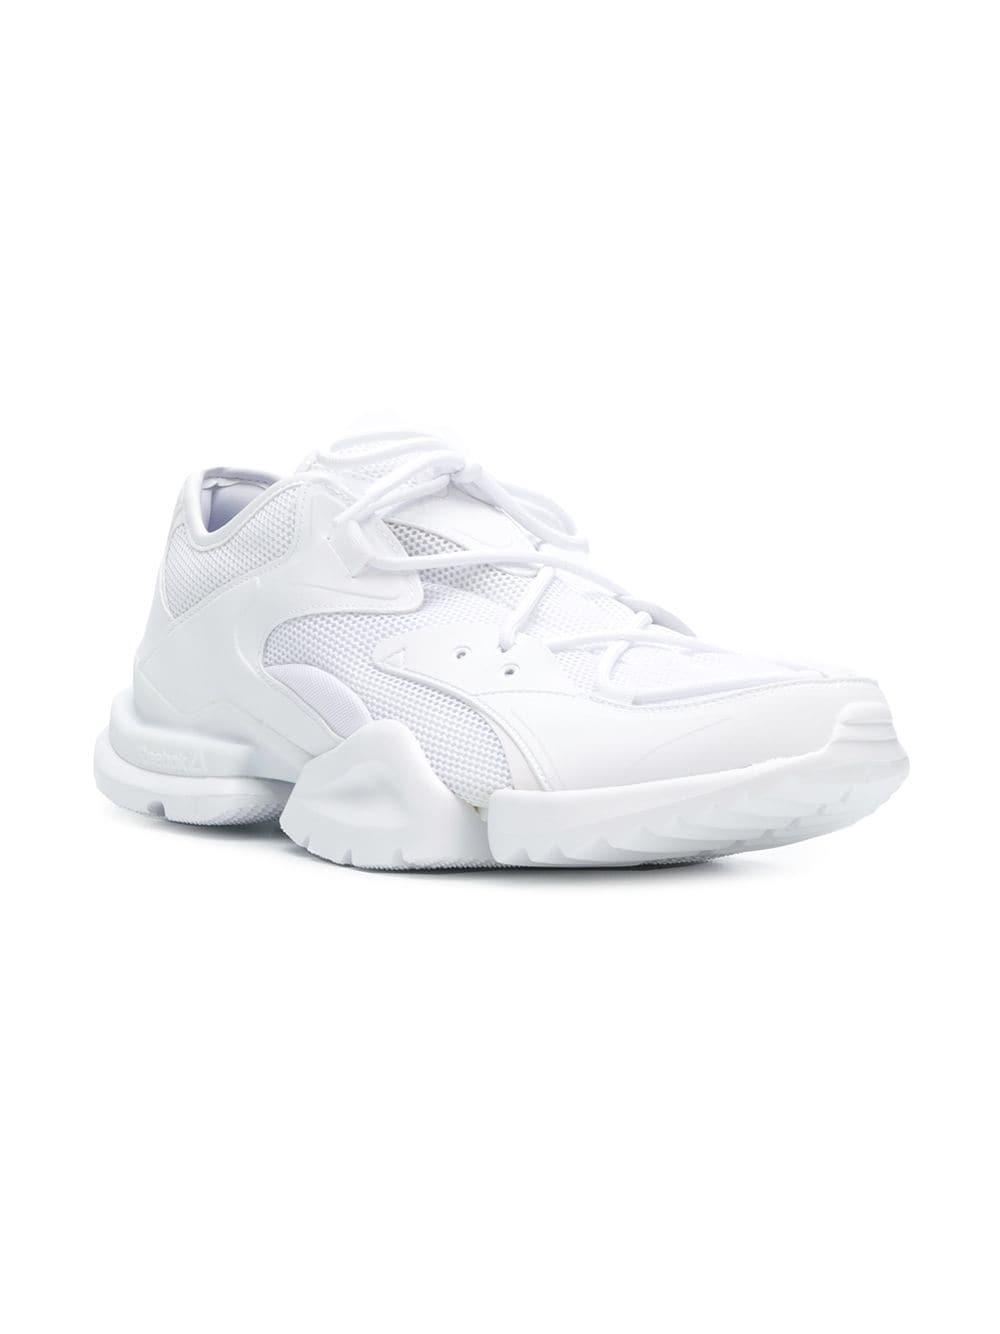 Reebok - White Run R 96 Sneakers for Men - Lyst. View fullscreen 334f5b4a5